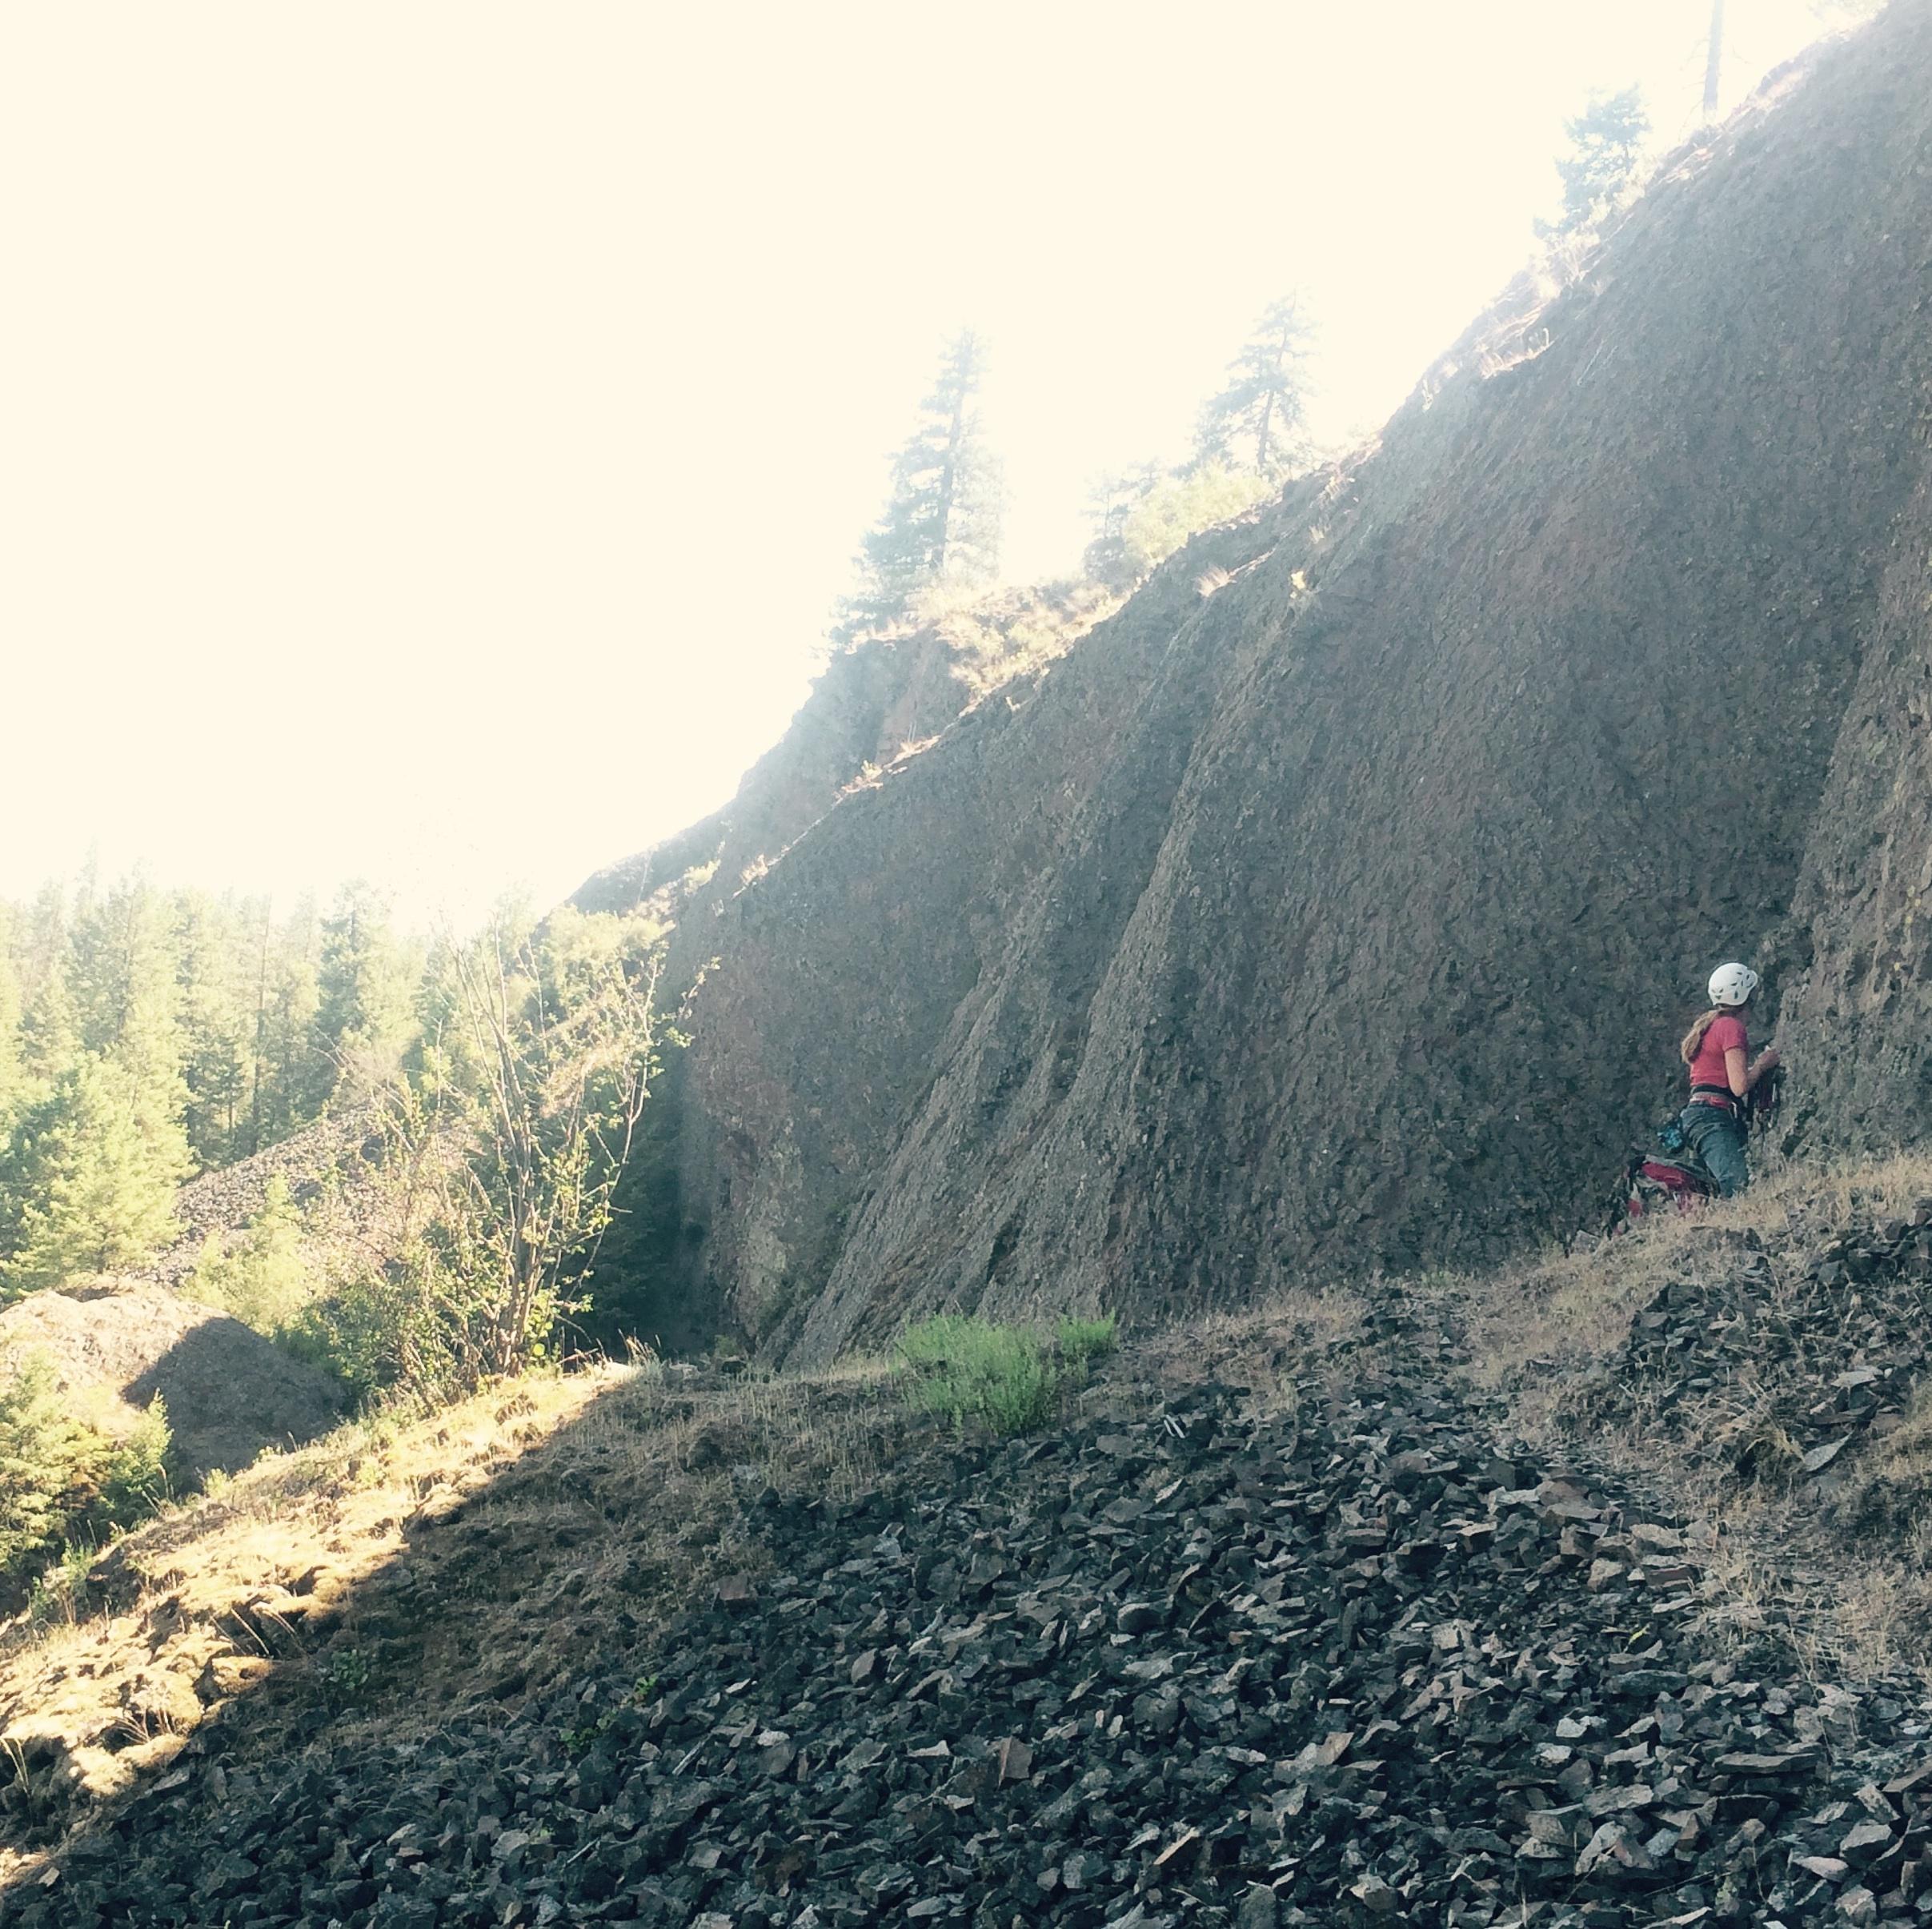 Deep-Creek-Canyon-rock-climbing-Wild-Walls-Spokane-Riverside